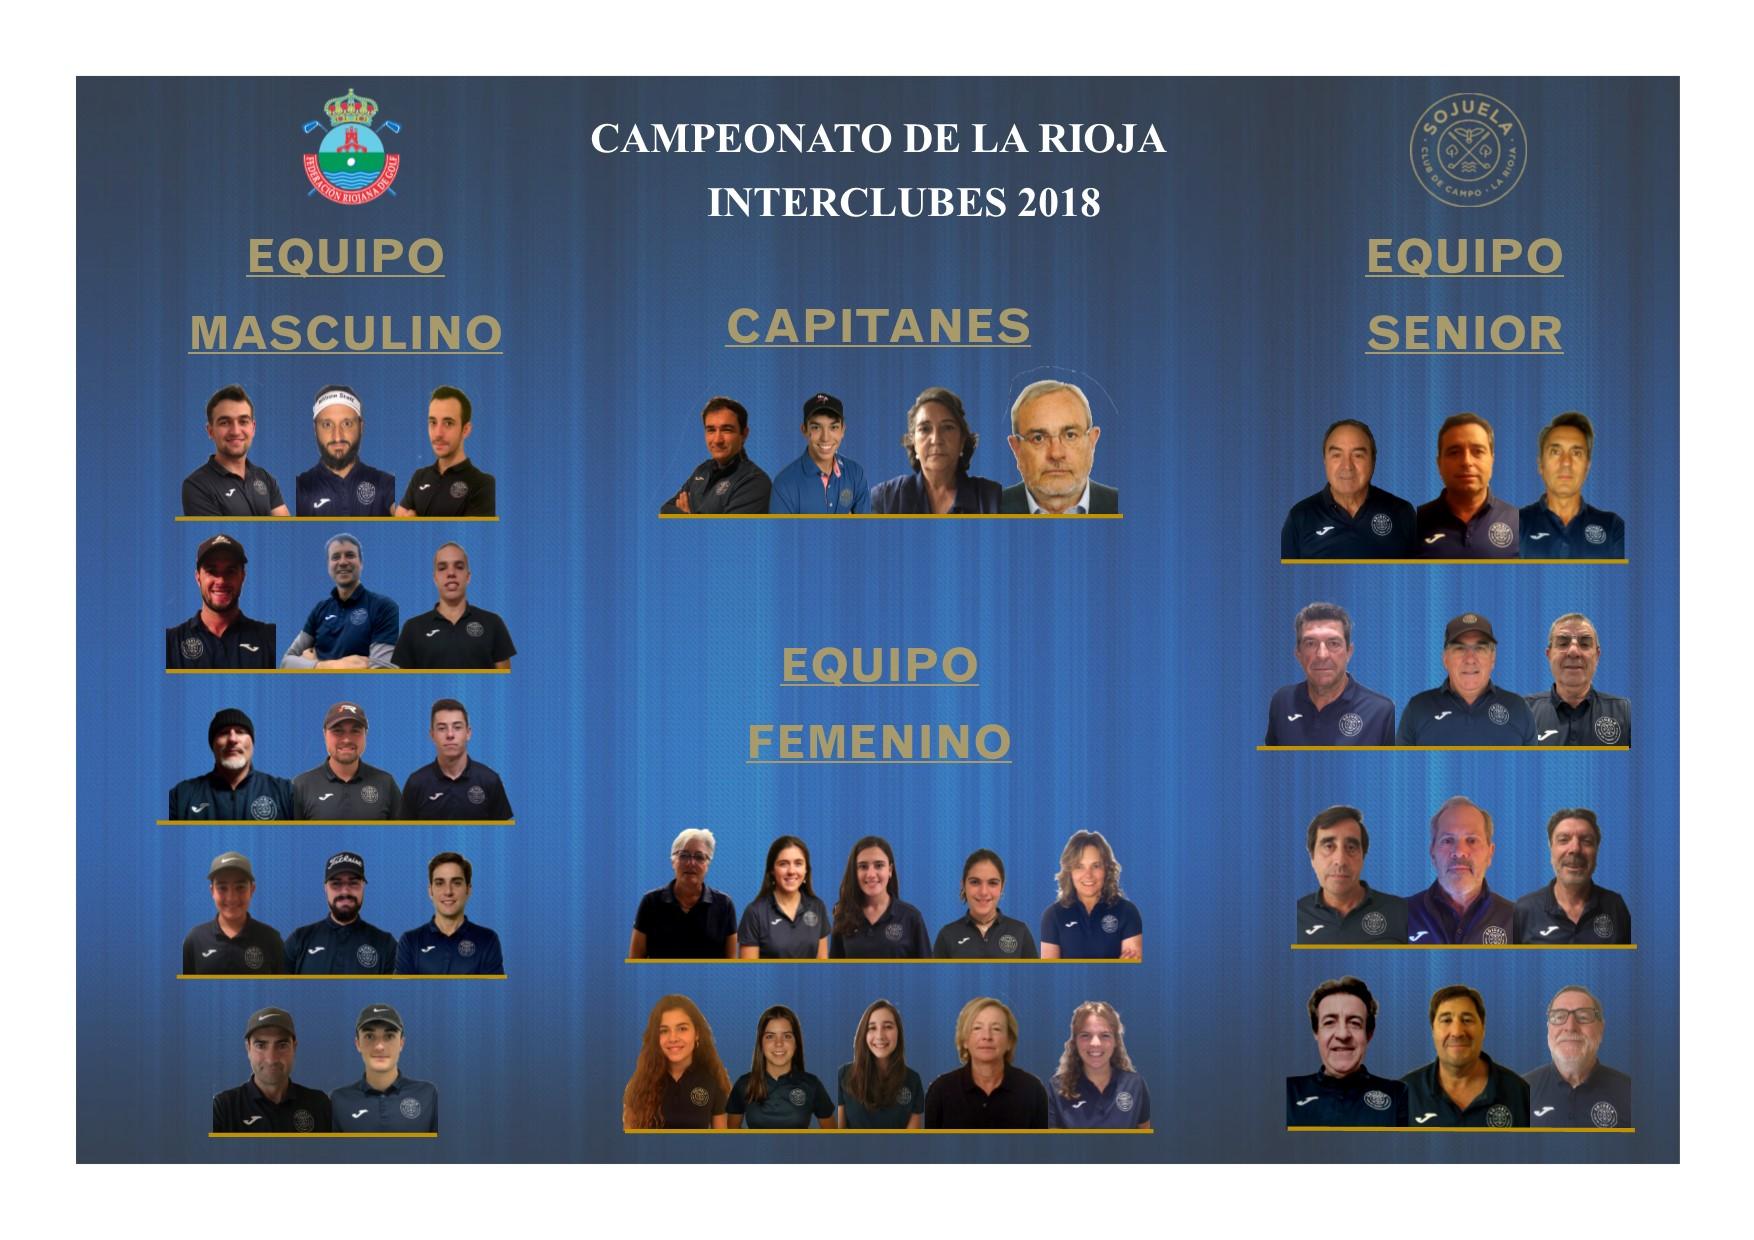 Campeonato de La Rioja Interclubes 2018